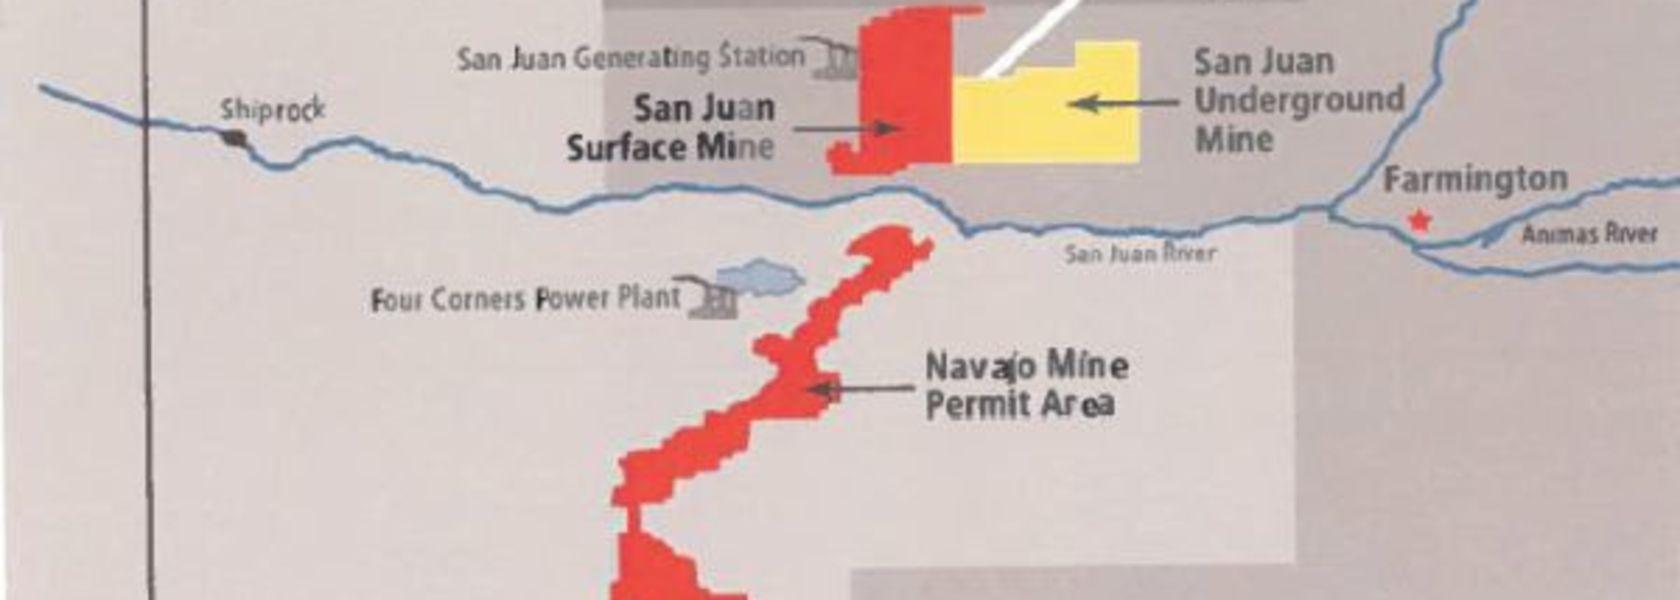 bhp navajo nation make deal for arizona mine miningmonthly com